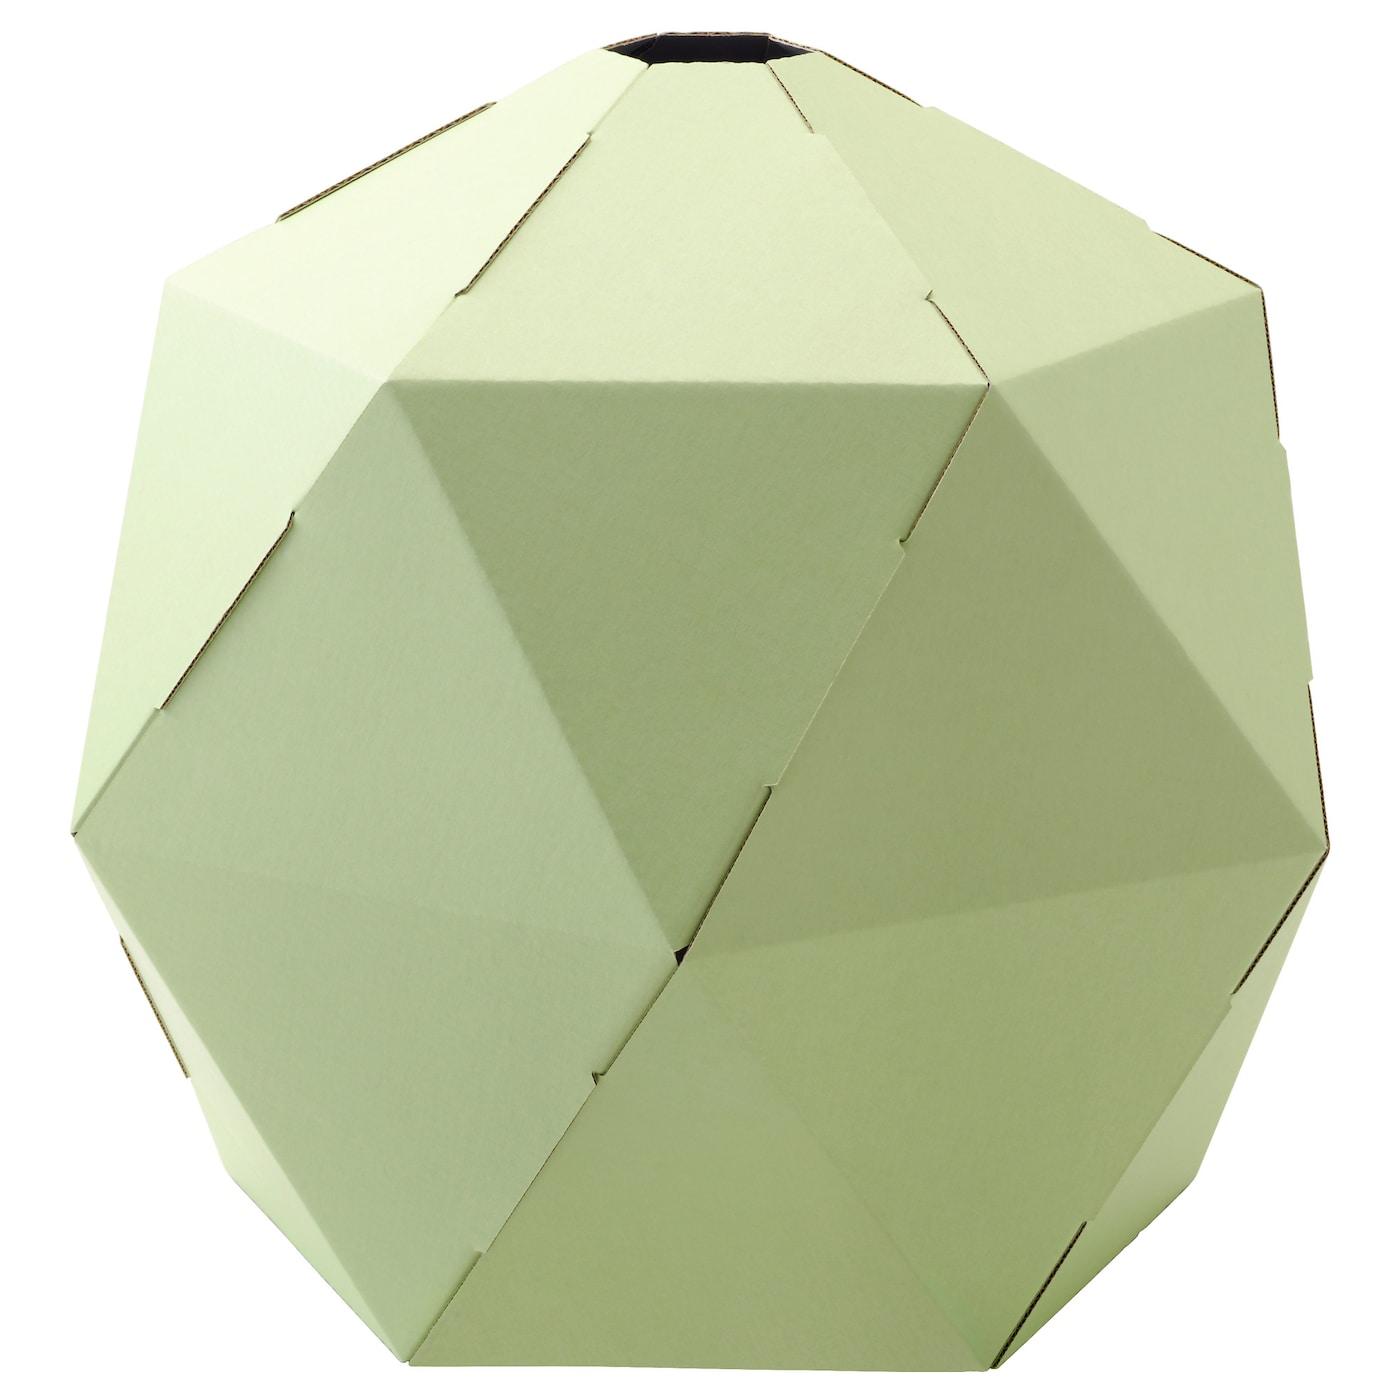 JOXTORP Pendant lamp shade Light green 44 cm - IKEA